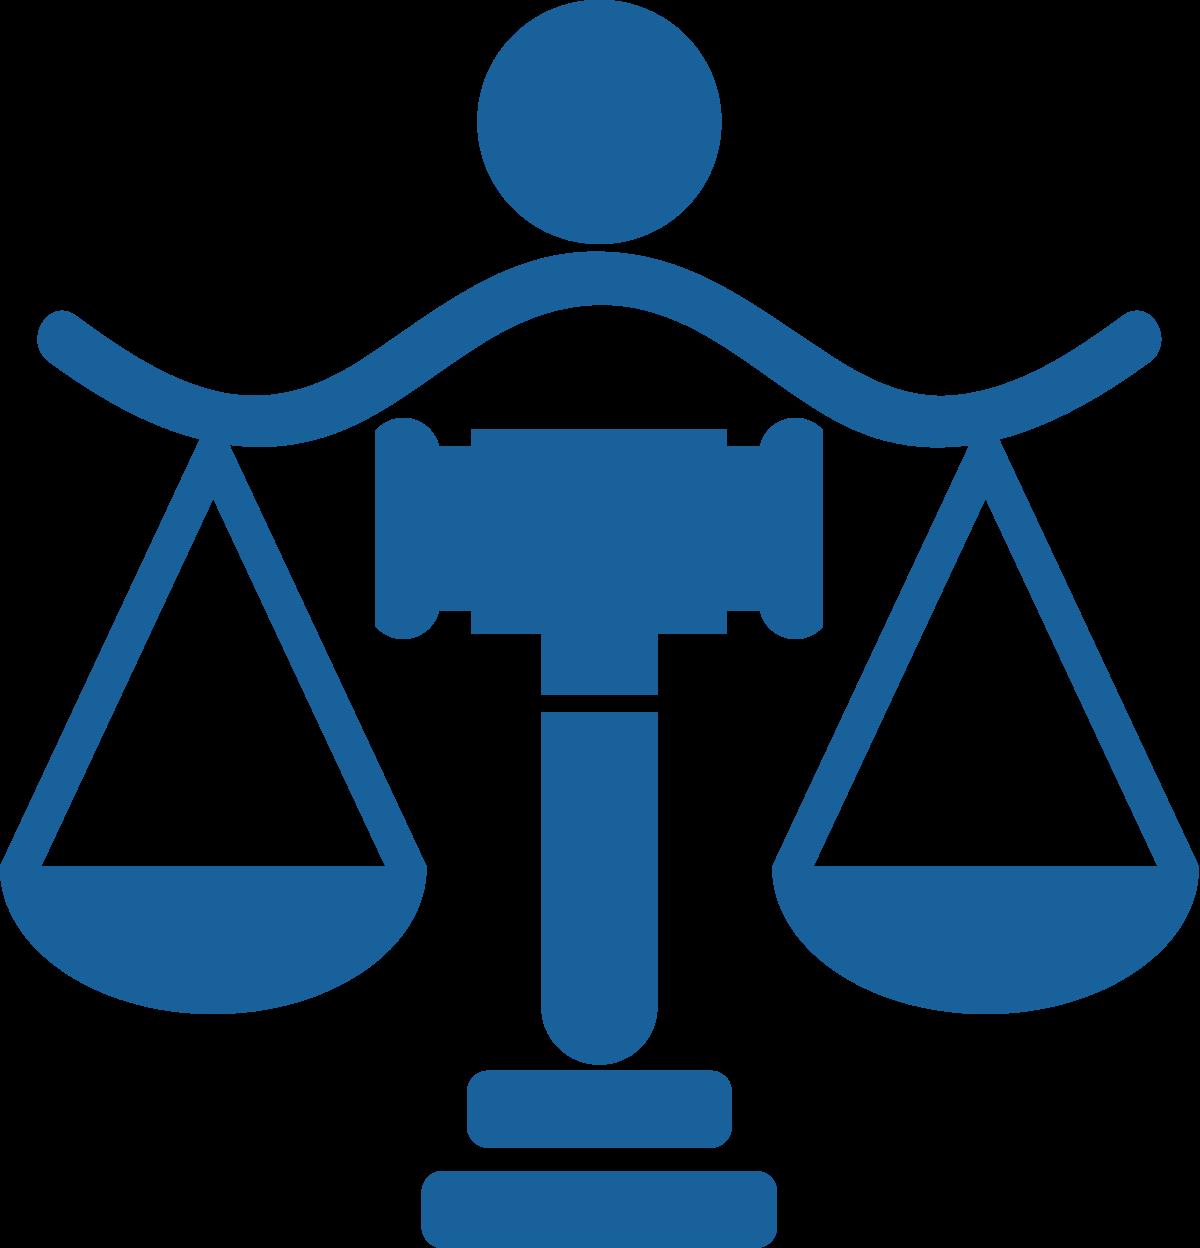 Judicial Free Download Best On Clipartmag Com Ⓒ.